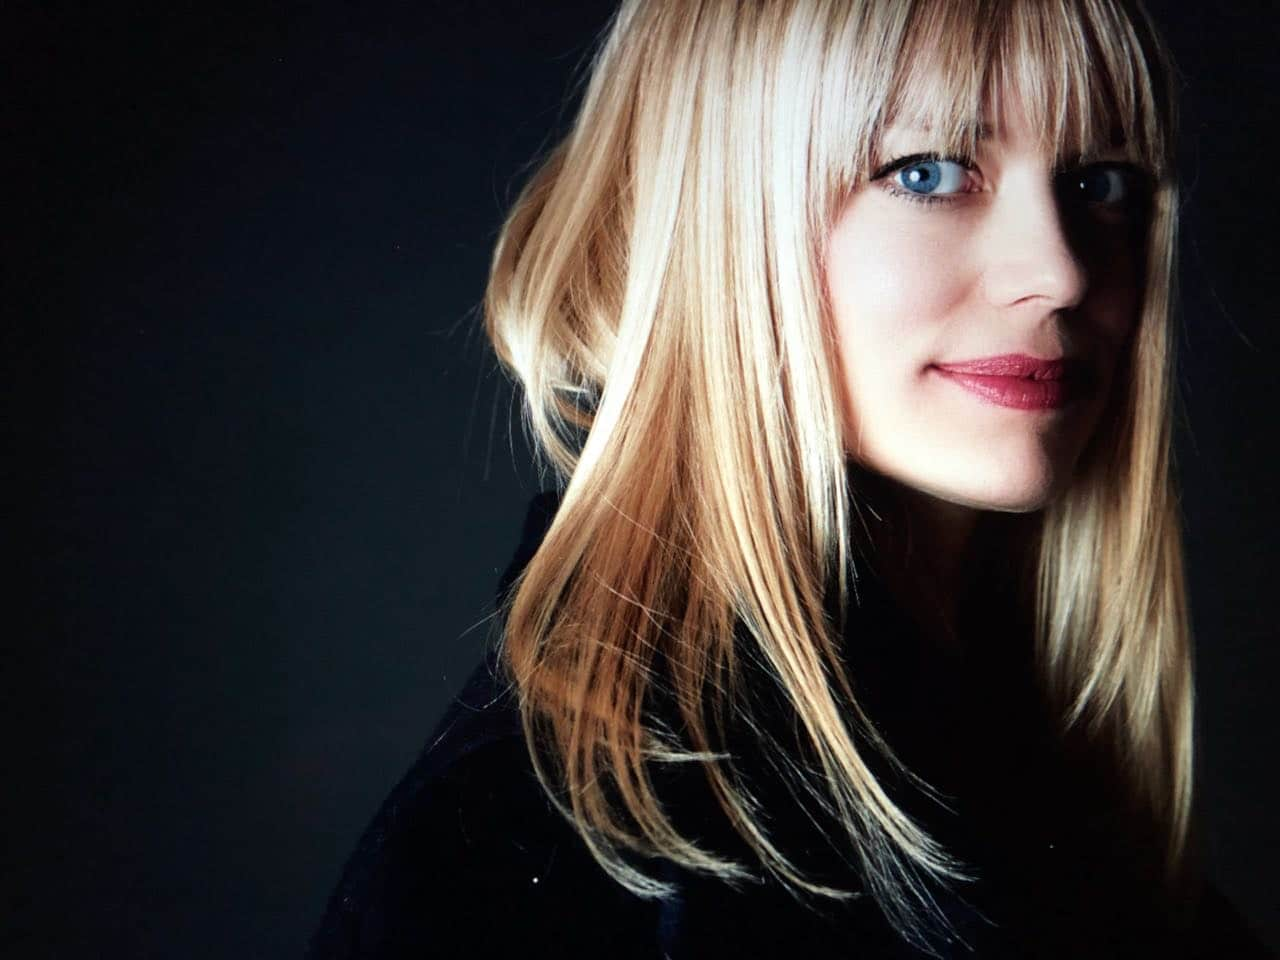 Interview mit Kathrin Englmann-Moosburger - Leitung Marke & Kommunikation bei Neumarkter Lammsbräu